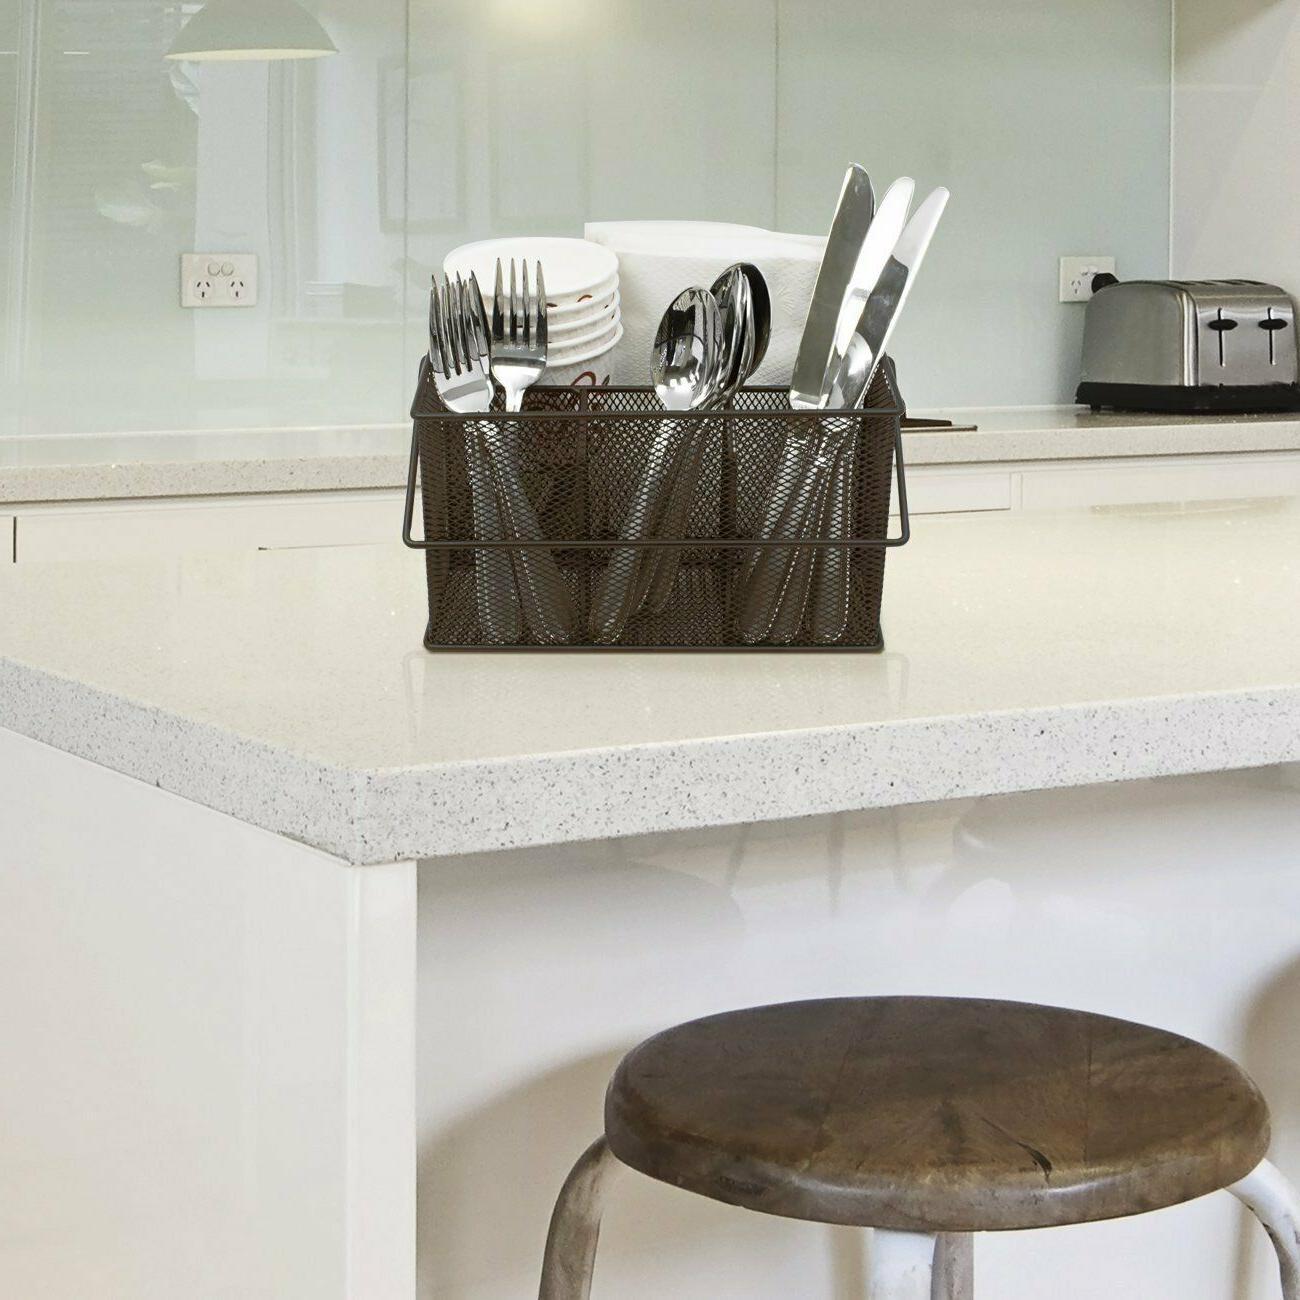 Sorbus Silverware, Holder, Condiment Organizer